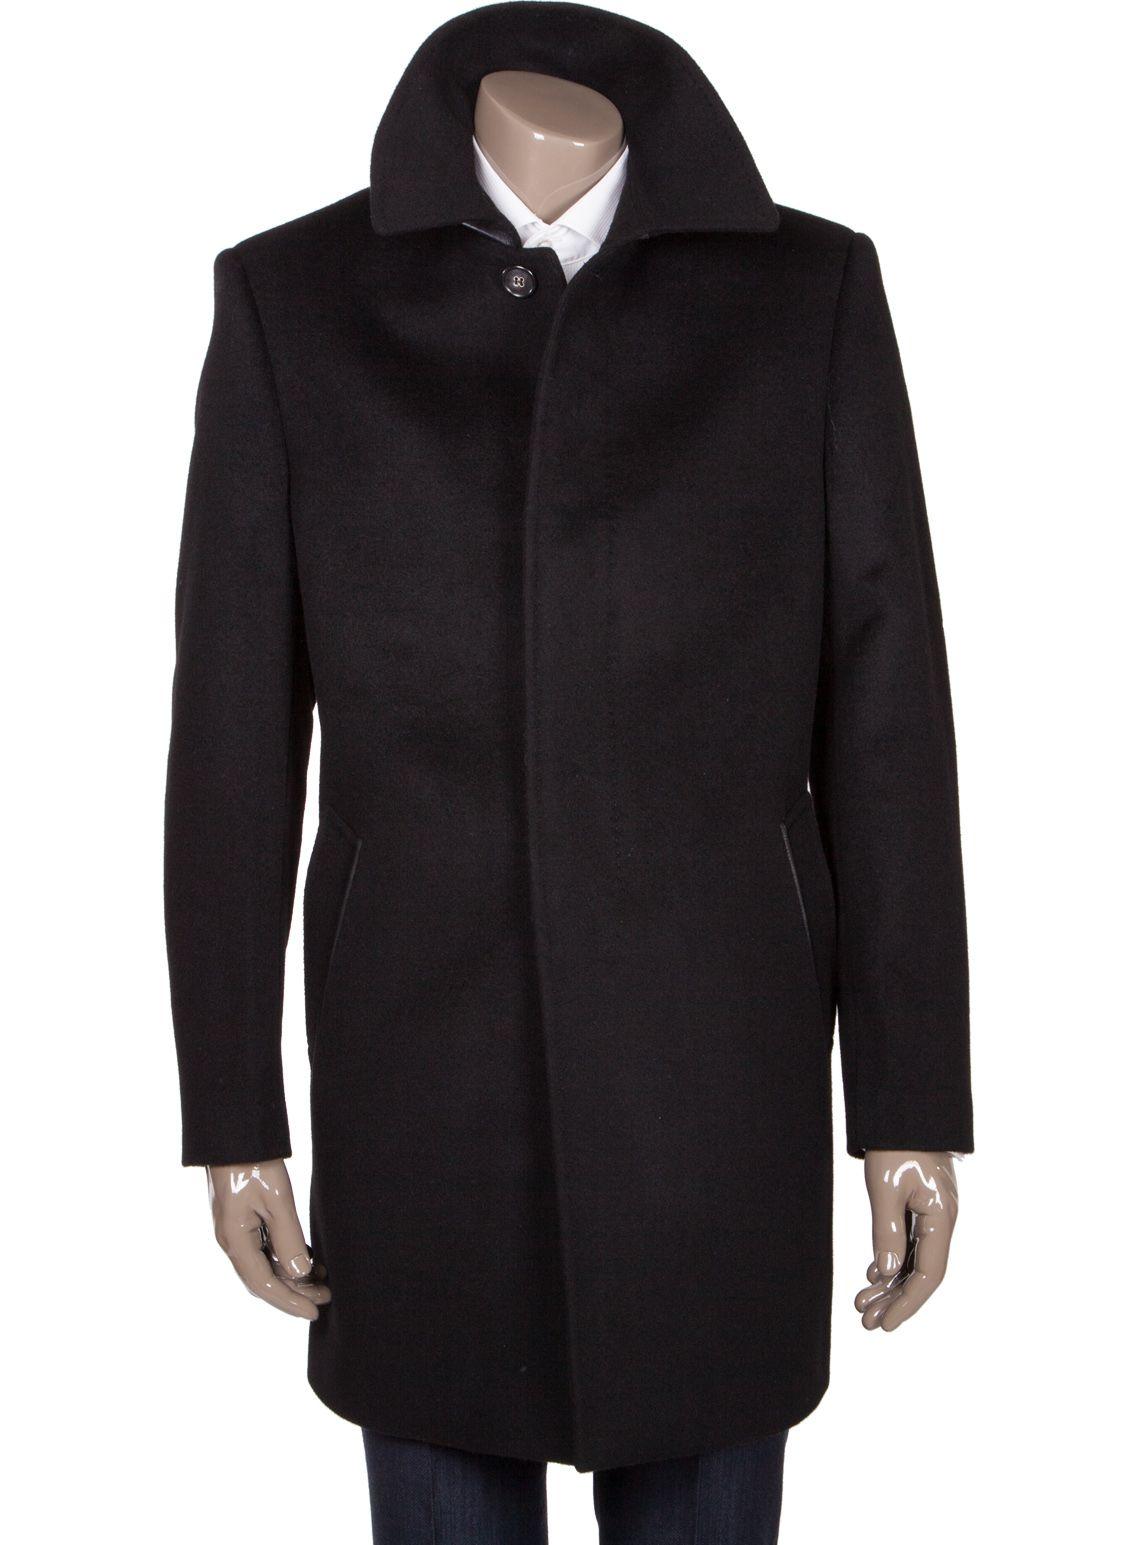 Black Overcoat at Westfield Bondi Junction